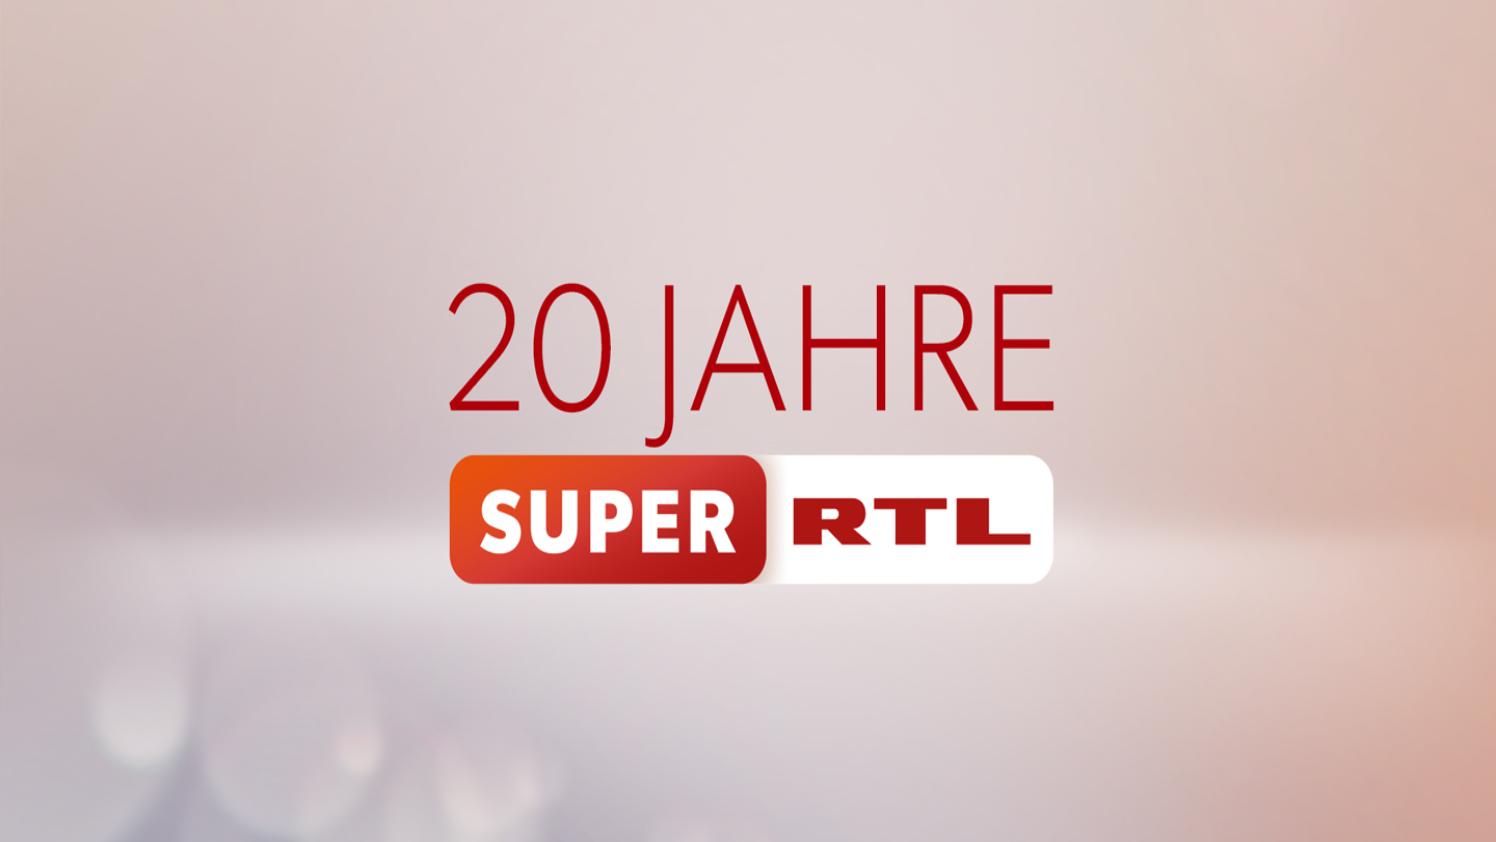 Super Rtl Feiert 20 Geburtstag Bertelsmann Se Co Kgaa